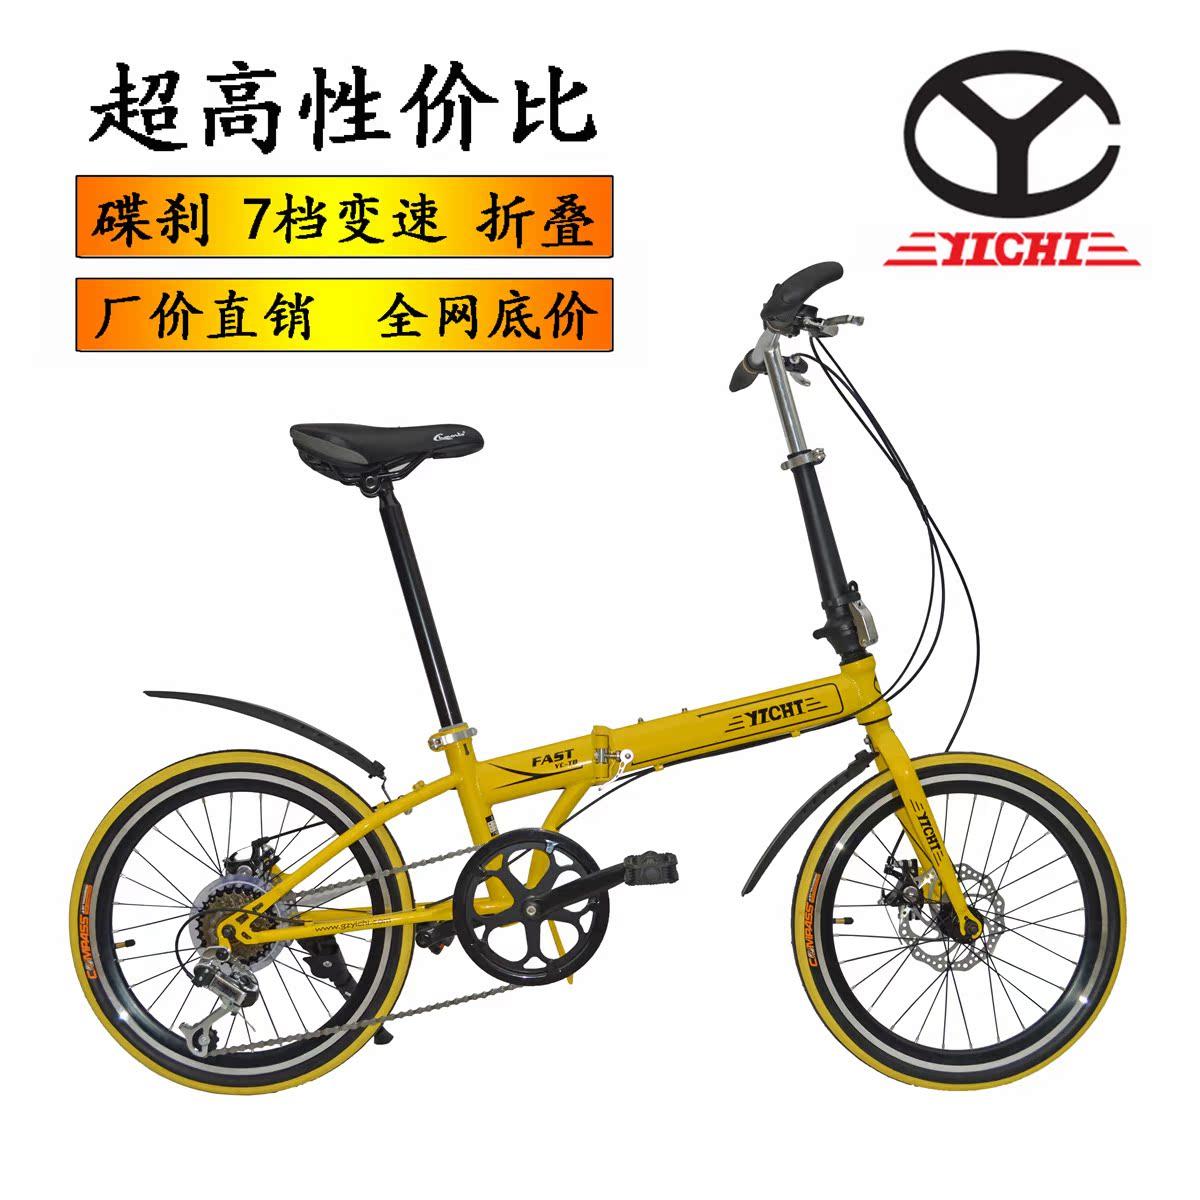 складной велосипед Wing Chi  20 Zxc складной велосипед million star dh01 20 zxc